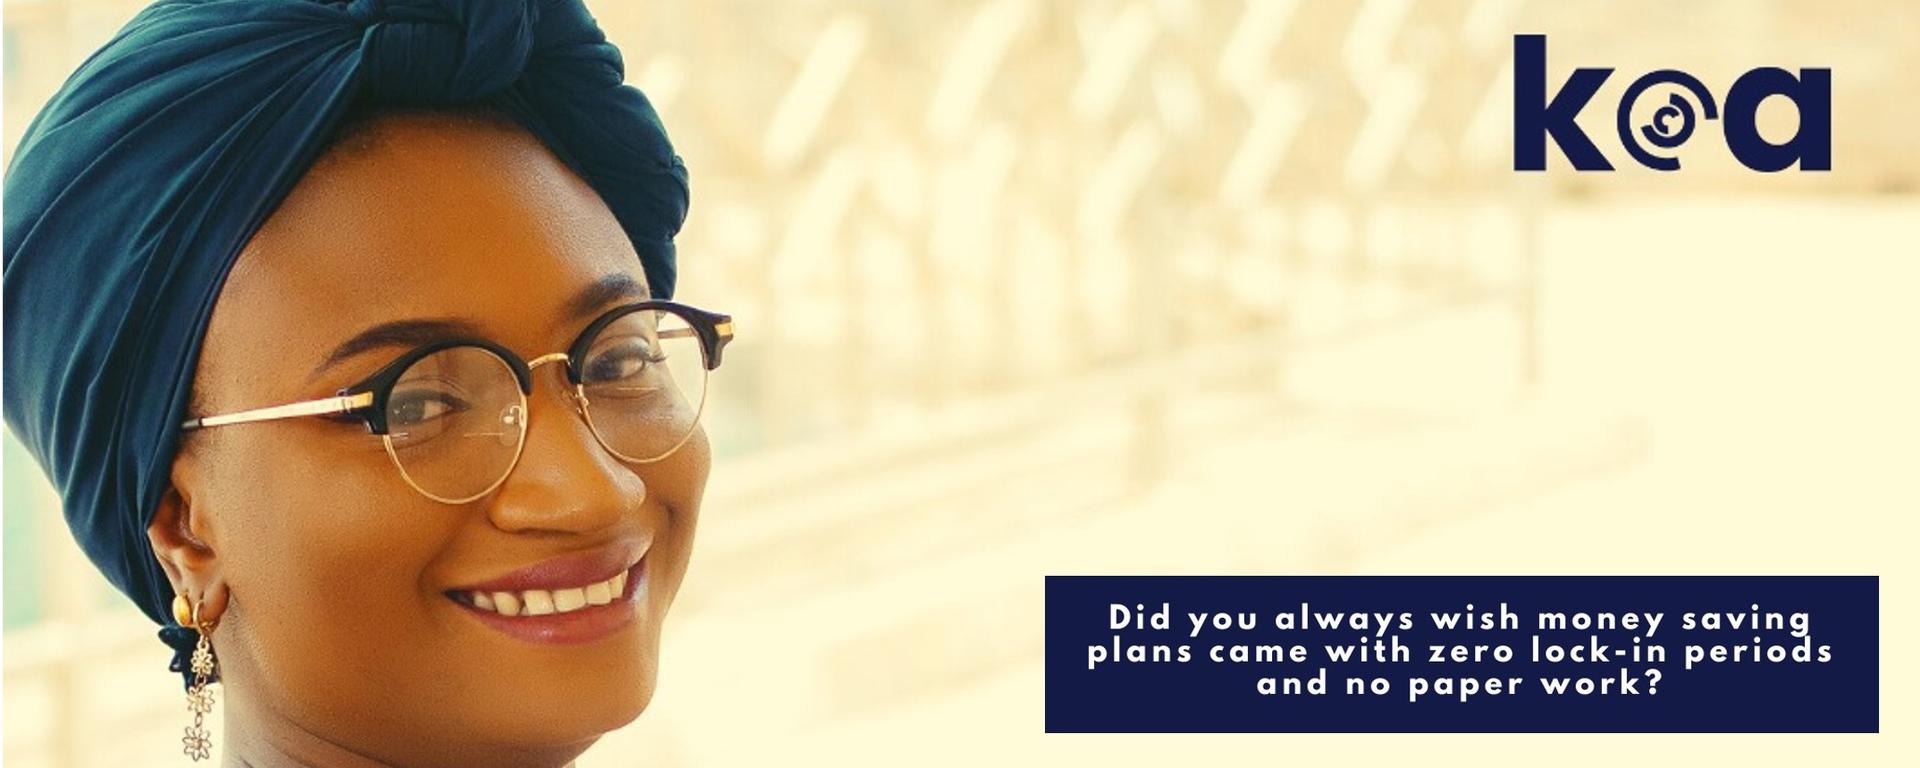 Koa - Technology Lead Movemeback African opportunity cover image